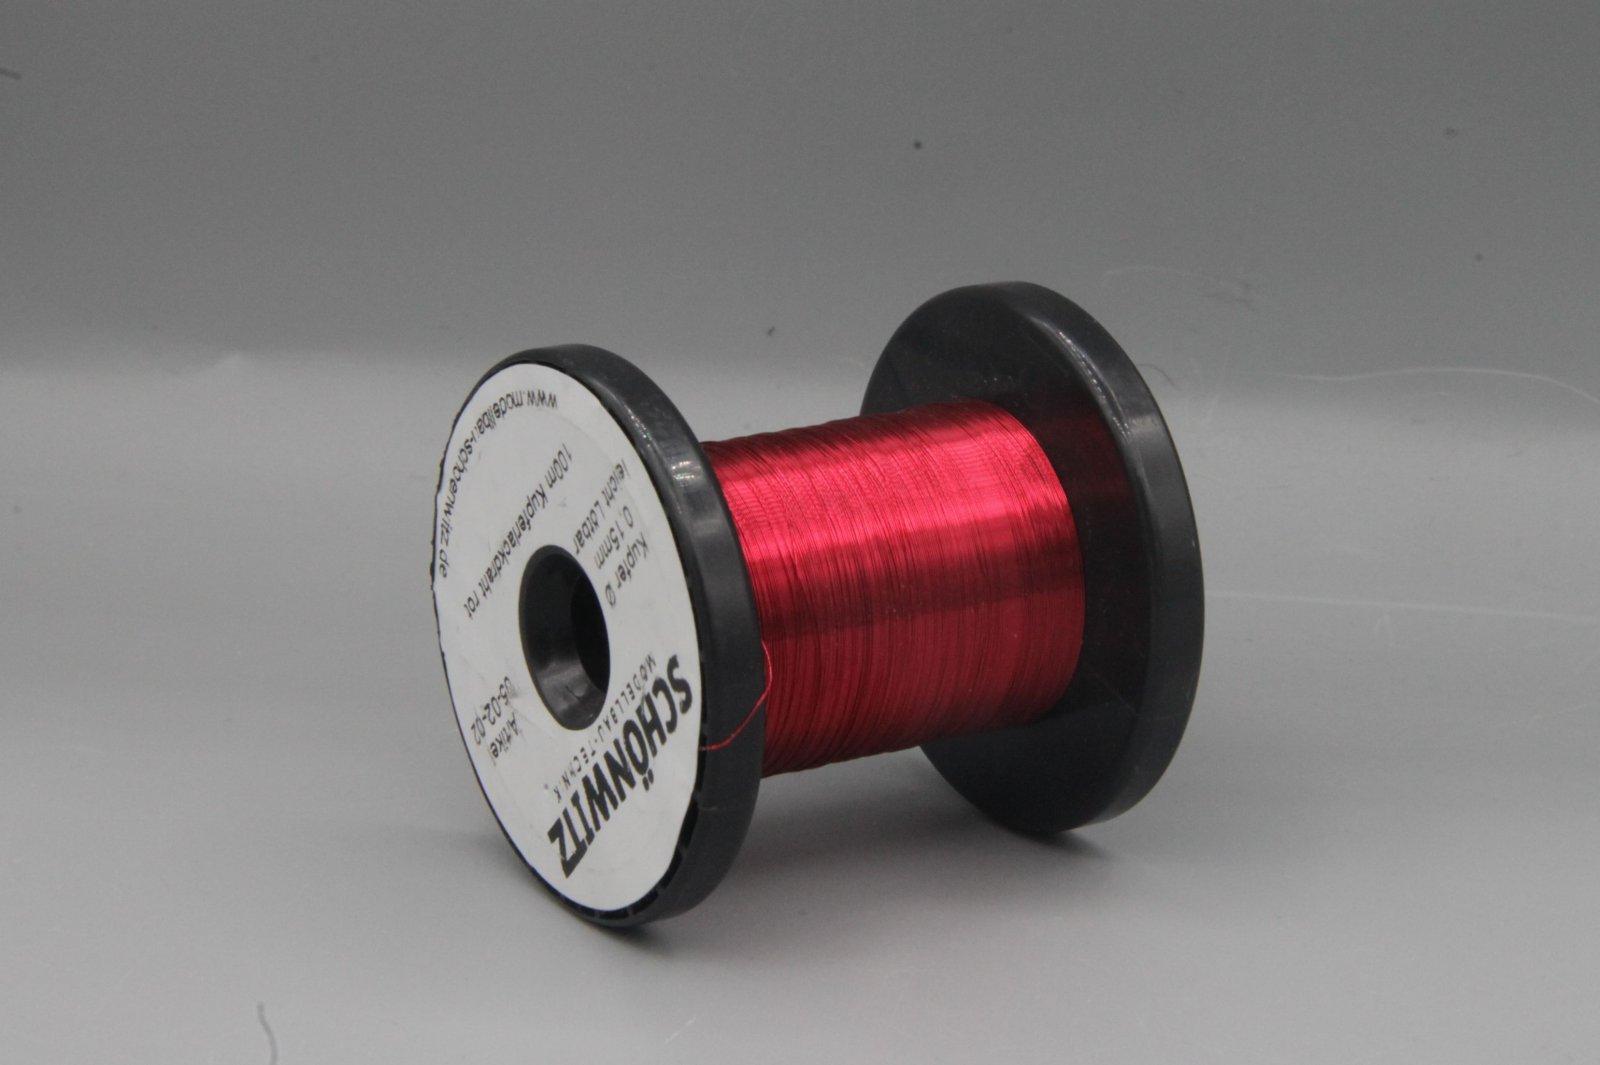 100 m Kupferlackdraht rot 0,15 mm Lackdraht Cu-Draht auf 50m-Spule